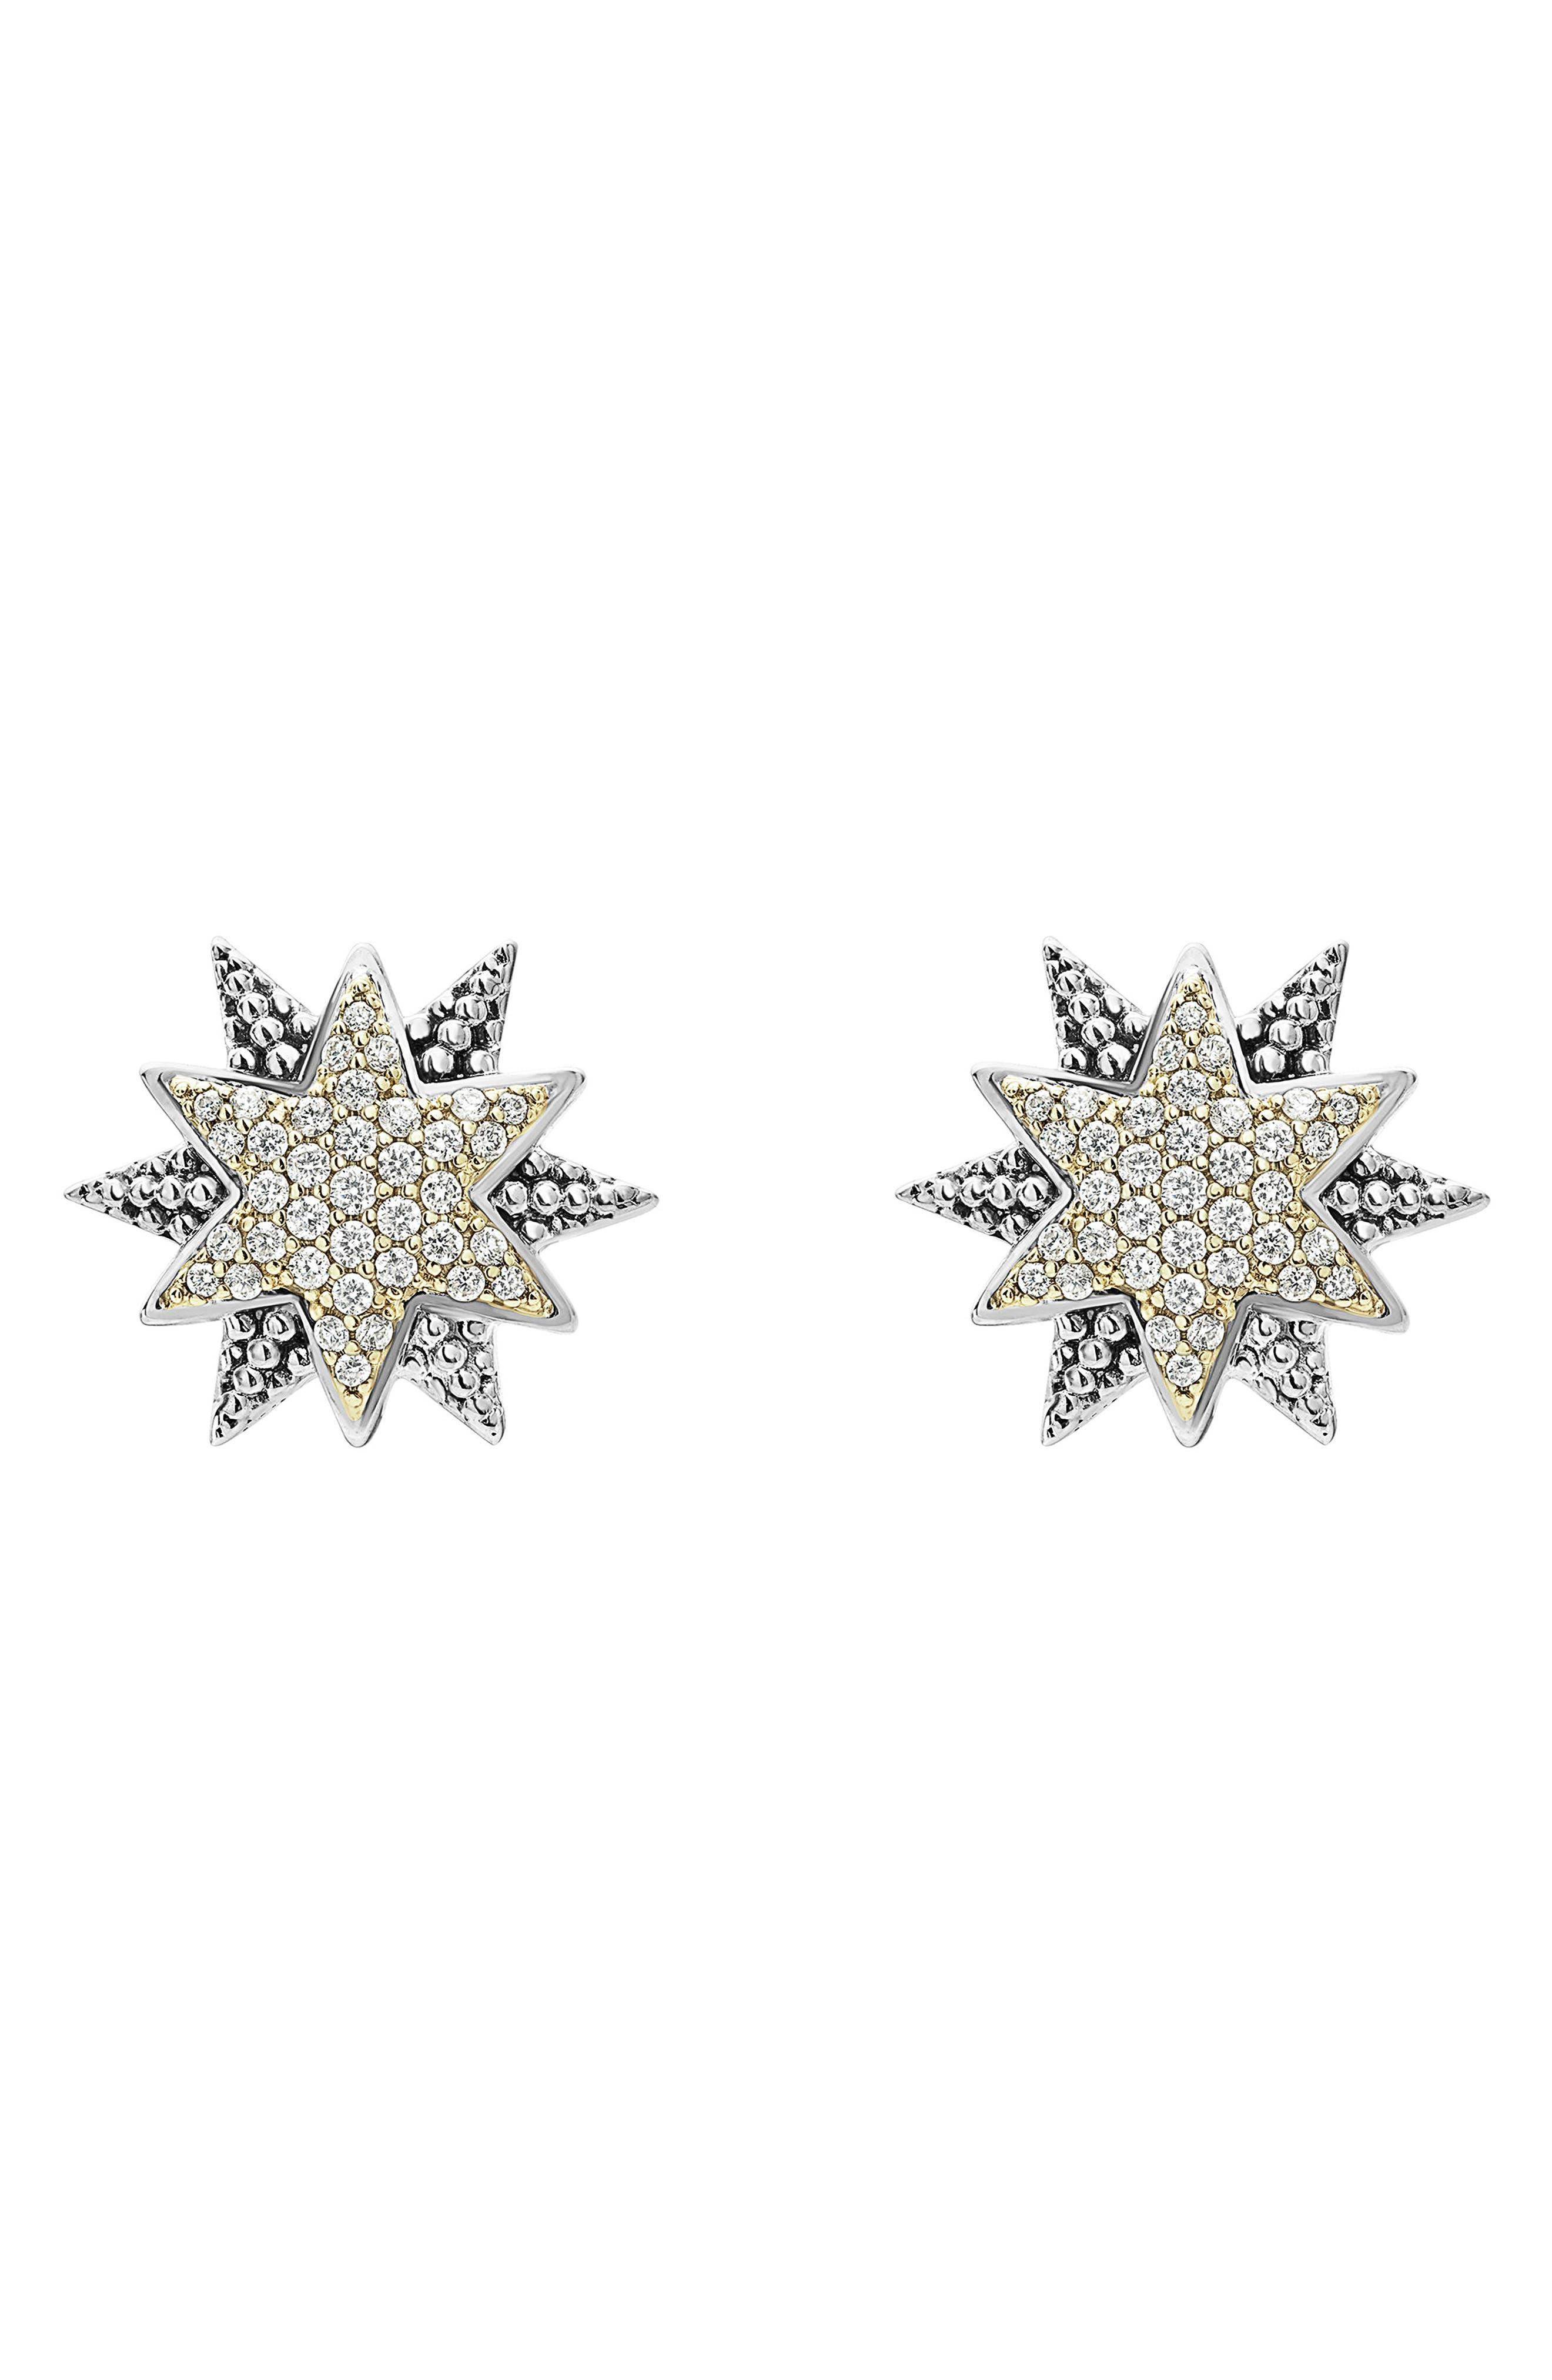 North Star Diamond Omega Earrings,                             Main thumbnail 1, color,                             DIAMOND